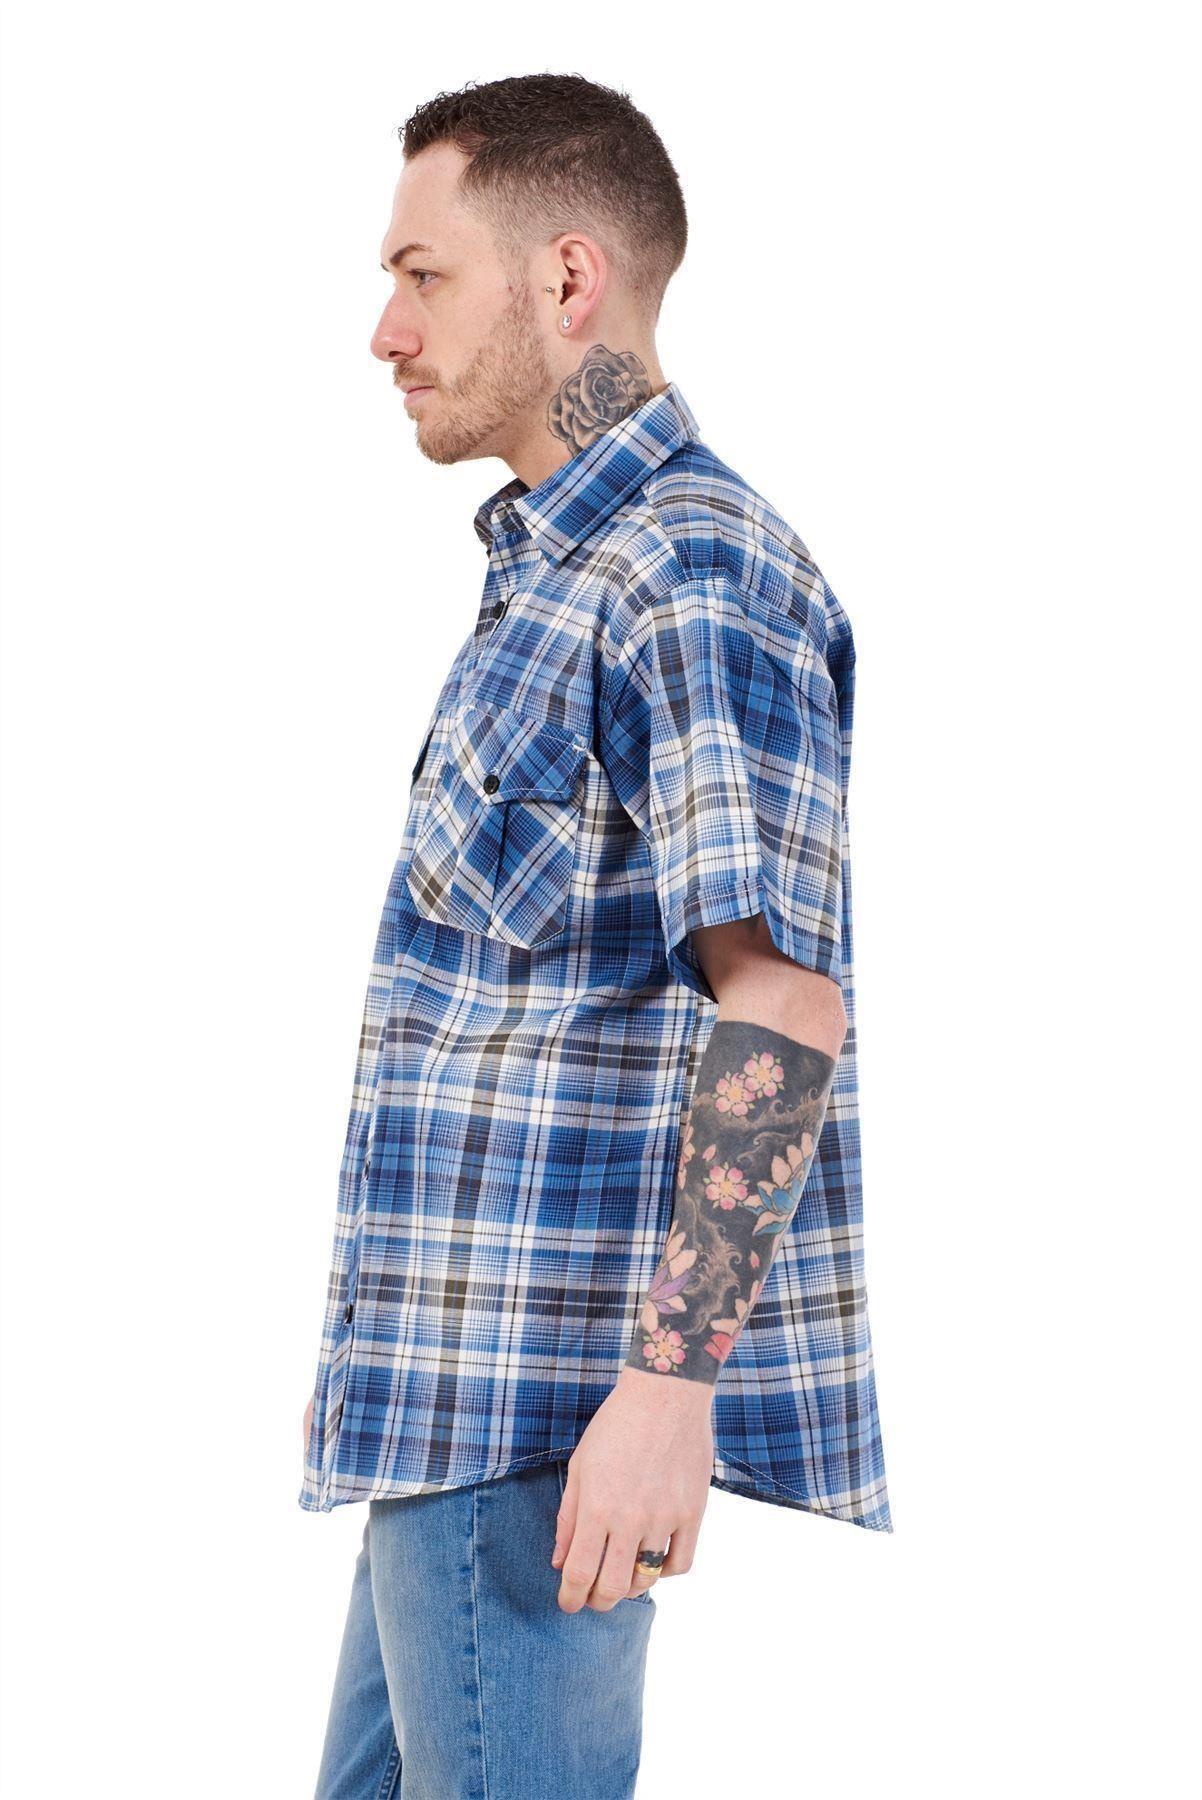 Mens-Regular-Big-Size-Shirts-Checked-Cotton-Blend-Casual-Short-Sleeve-Blue-M-5XL thumbnail 9